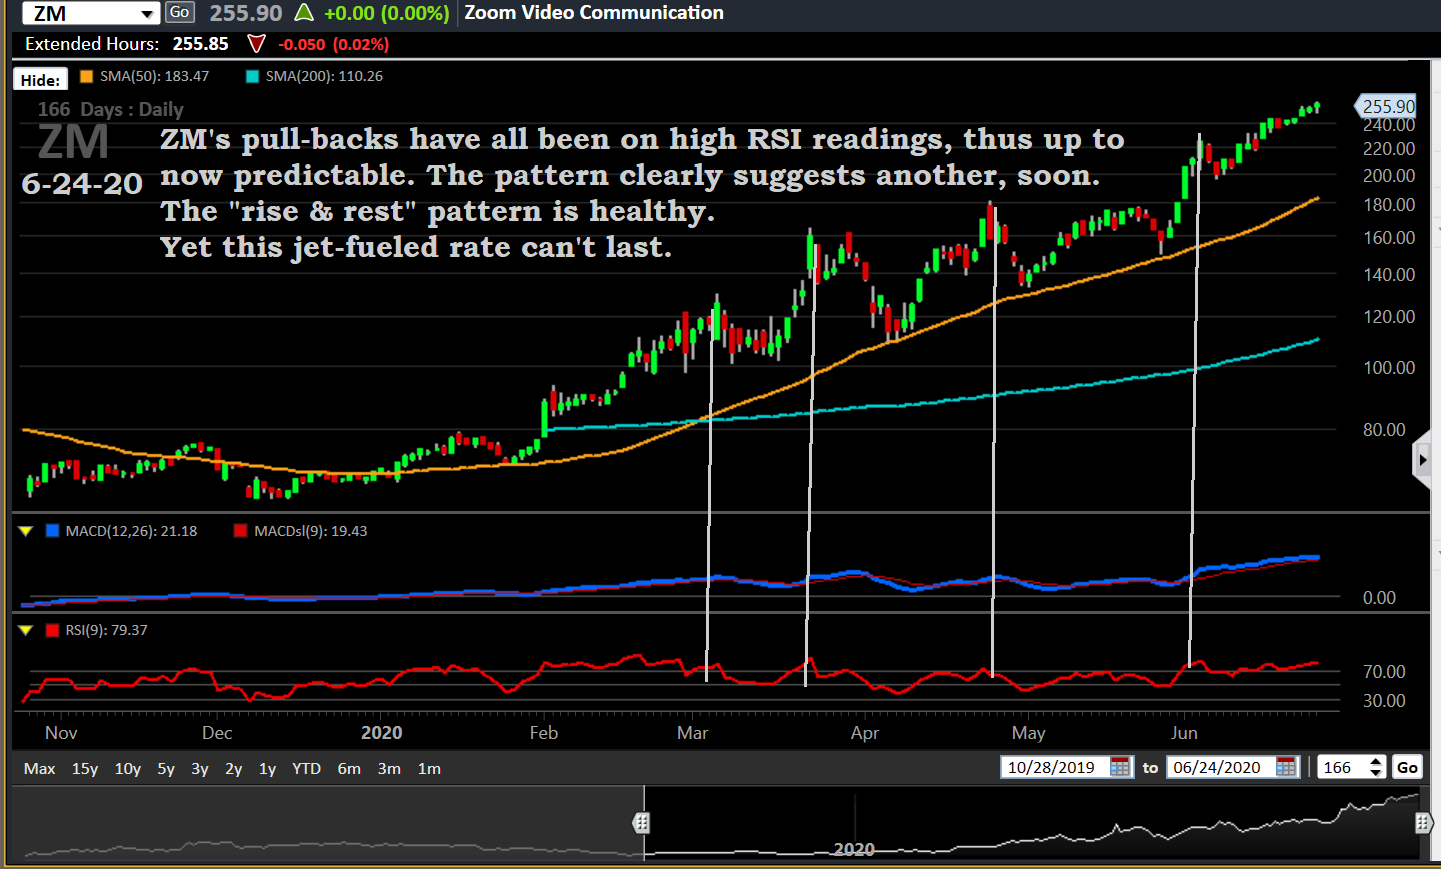 ZM, chart 6-24-20